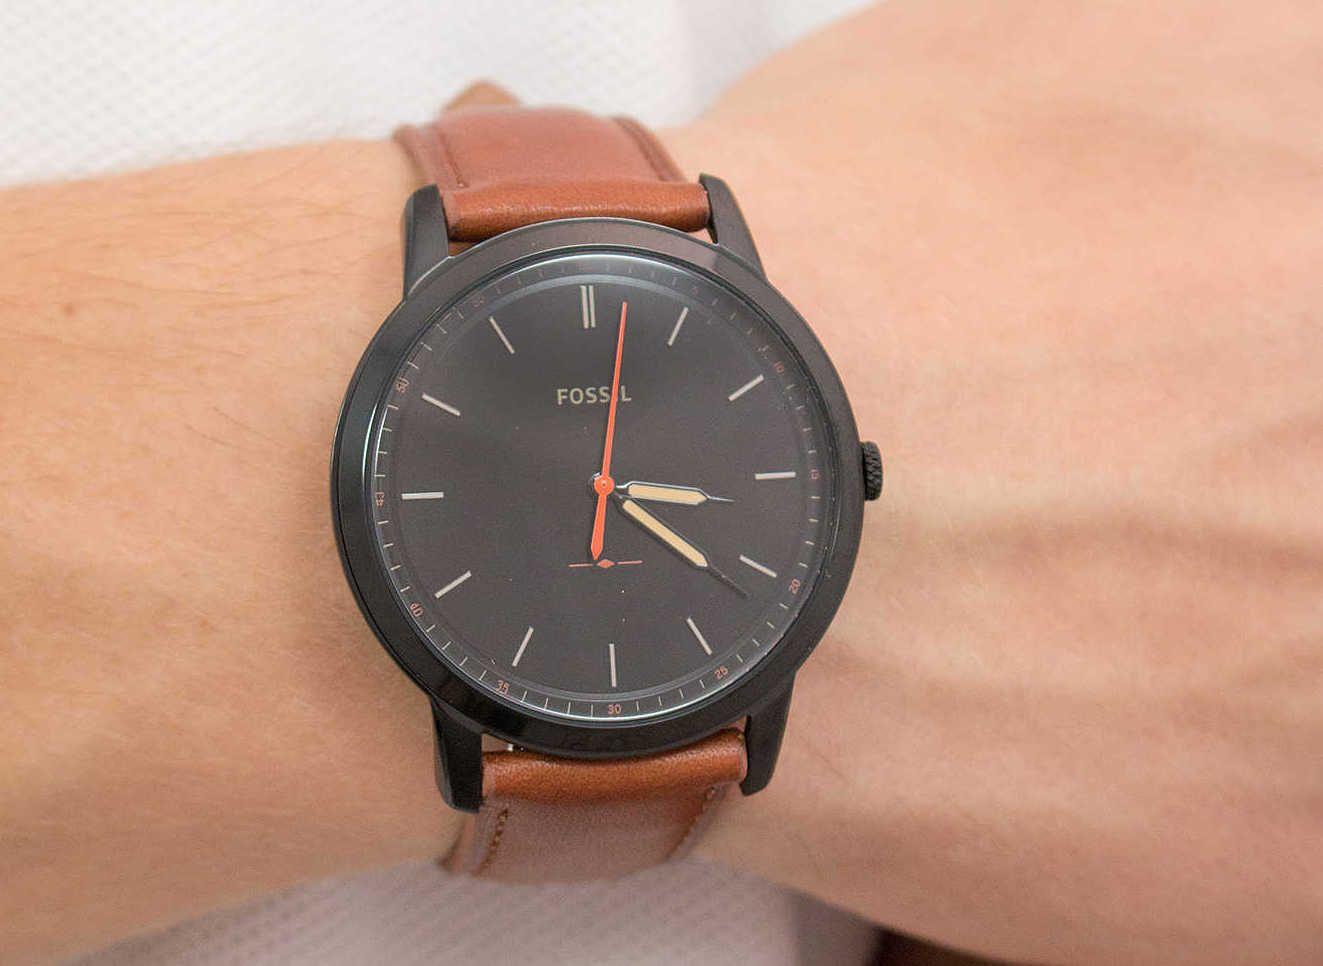 Fossil Gen 5 Smartwatch The Carlyle HR Watch